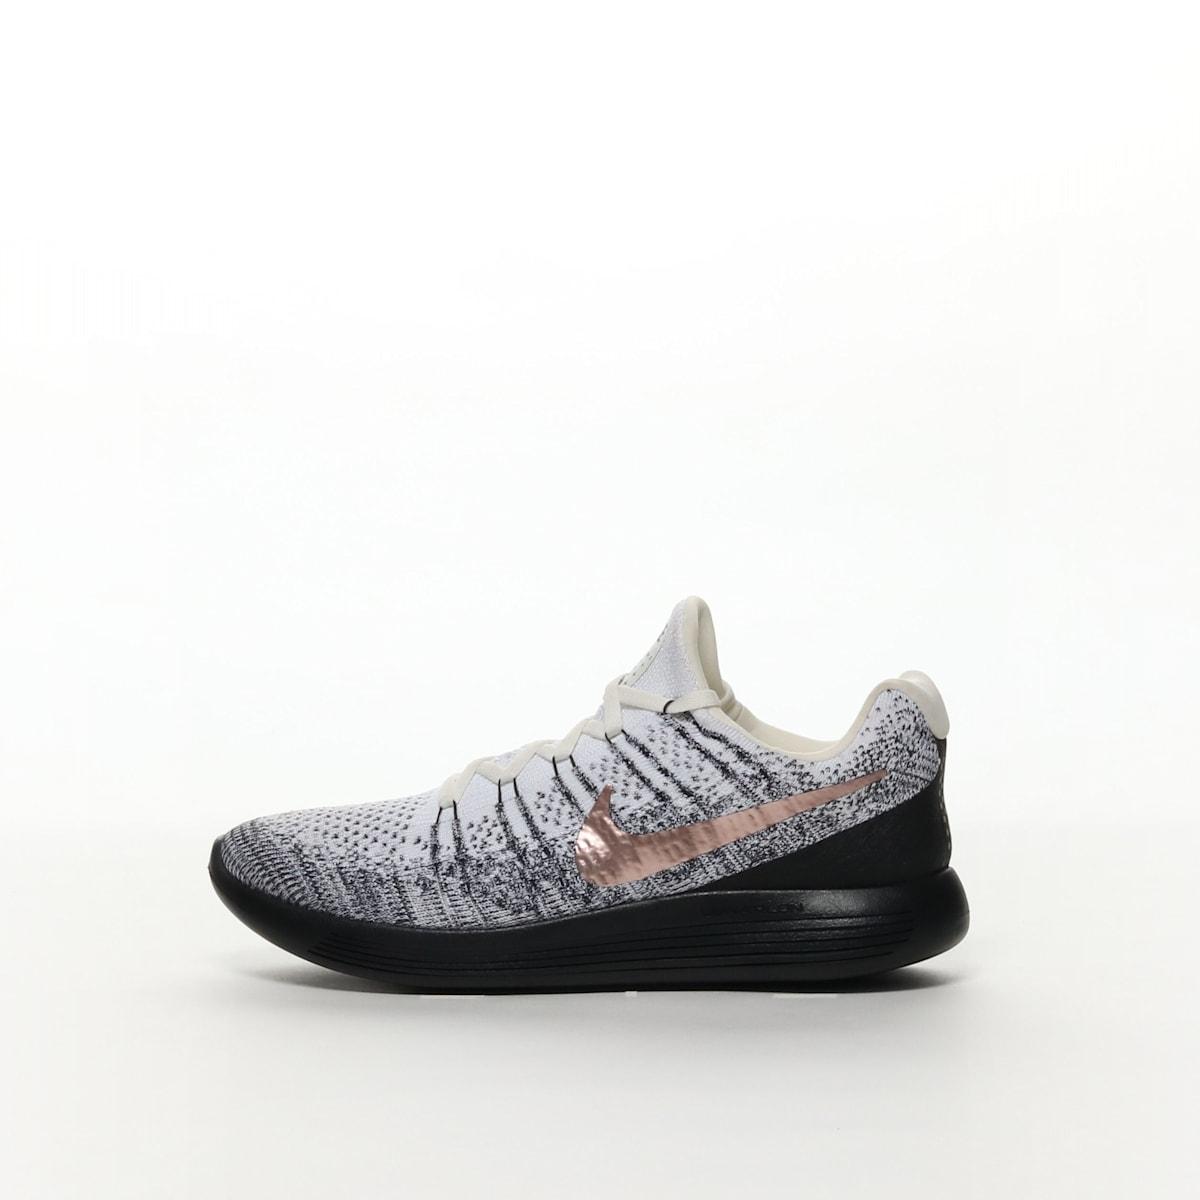 0a7dd36e642d Men s Nike LunarEpic Low Flyknit 2 X-Plore Running Shoe - WHITE ...